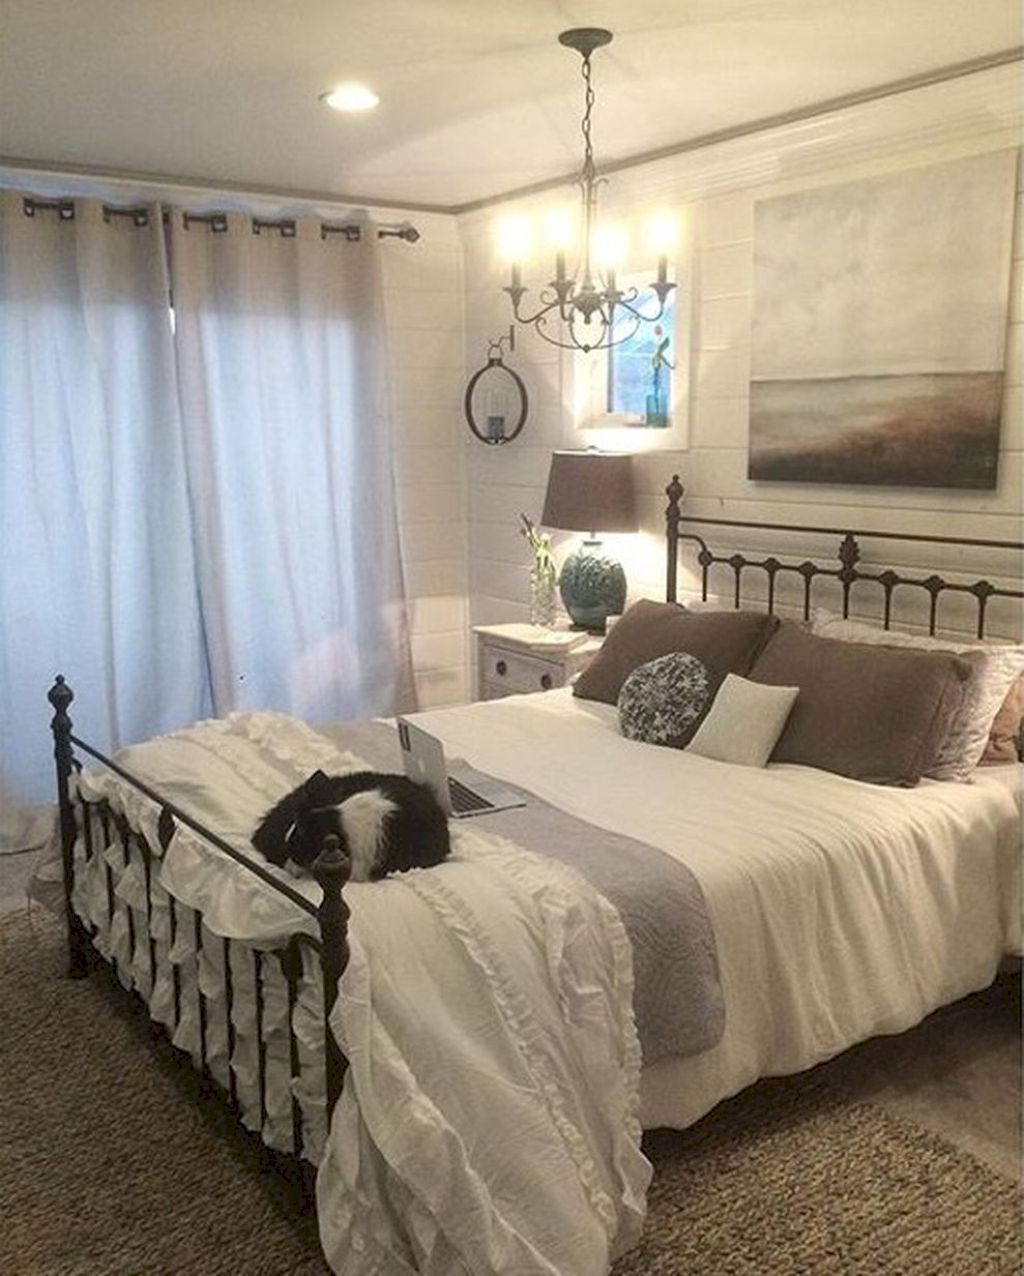 Bedroom Ideas 52 Modern Design Ideas For Your Bedroom: Gorgeous 75 Cozy Modern Farmhouse Bedroom Decor Ideas